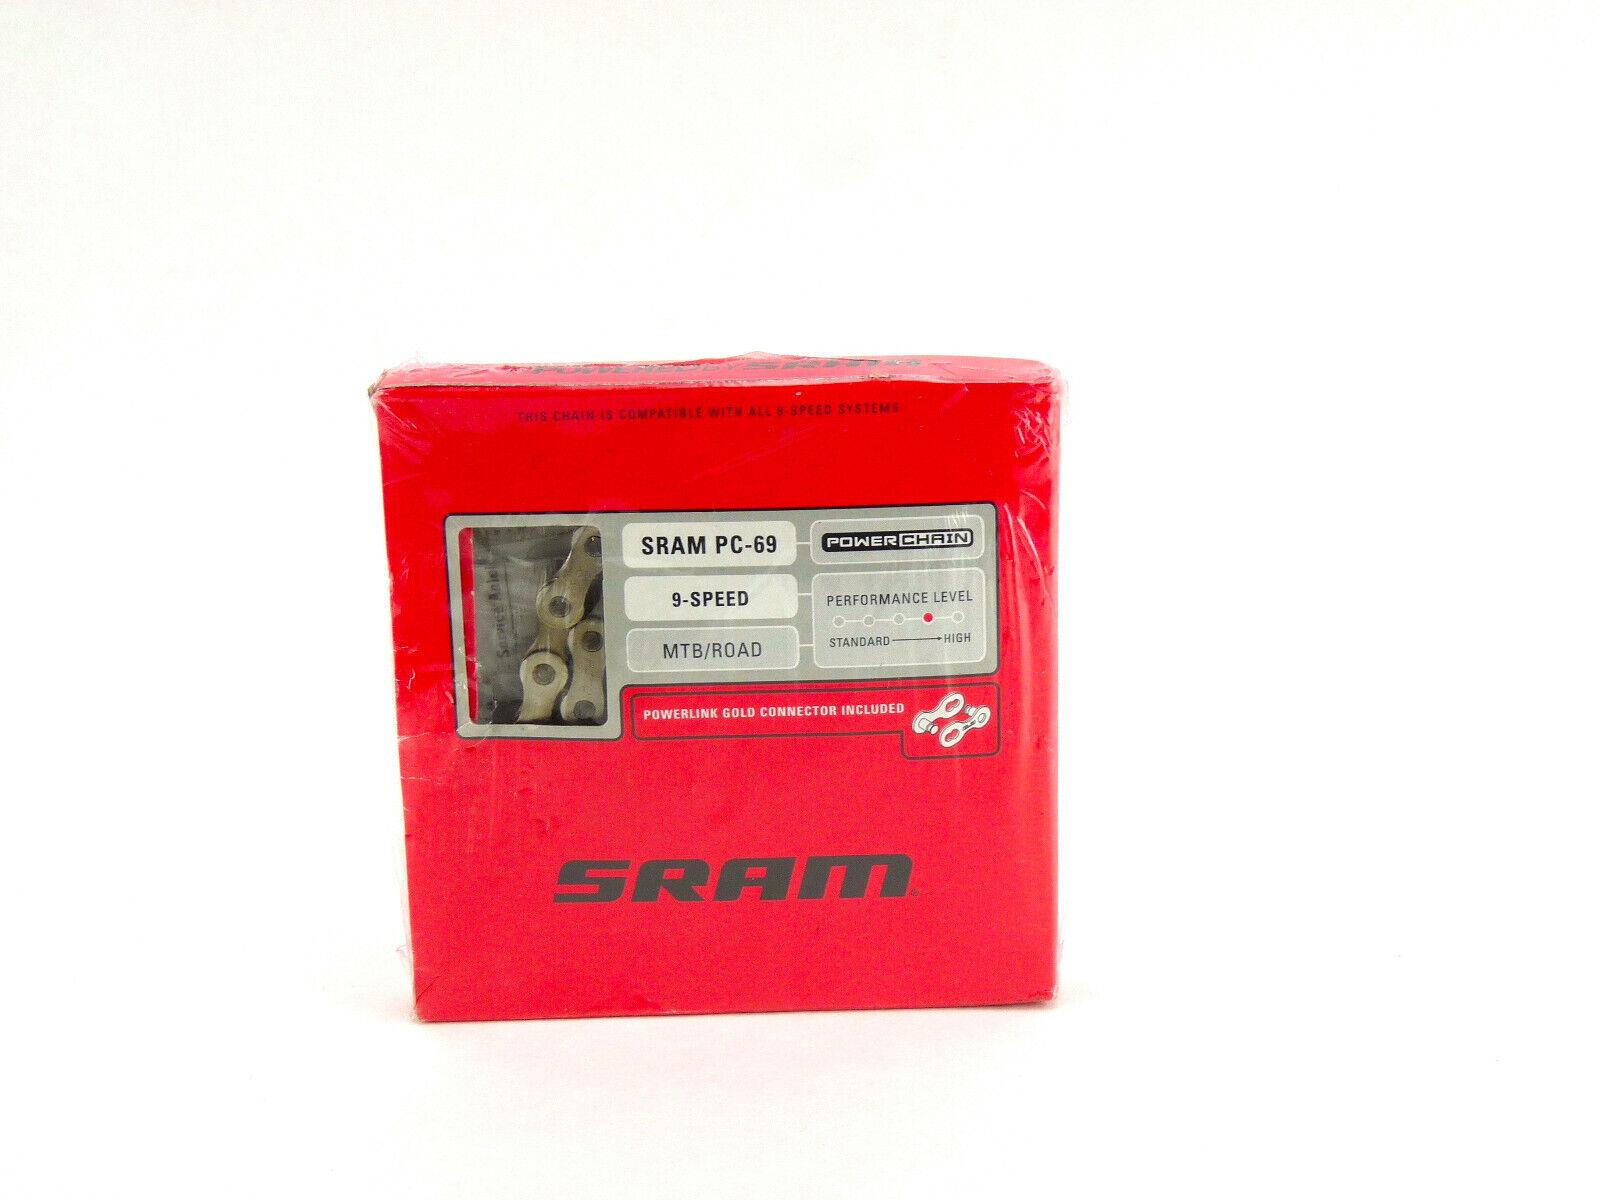 SRAM PC-951 PC-971 PC-991 9Speed Bike Chain 114 Links Gray Chains fits x5 x7